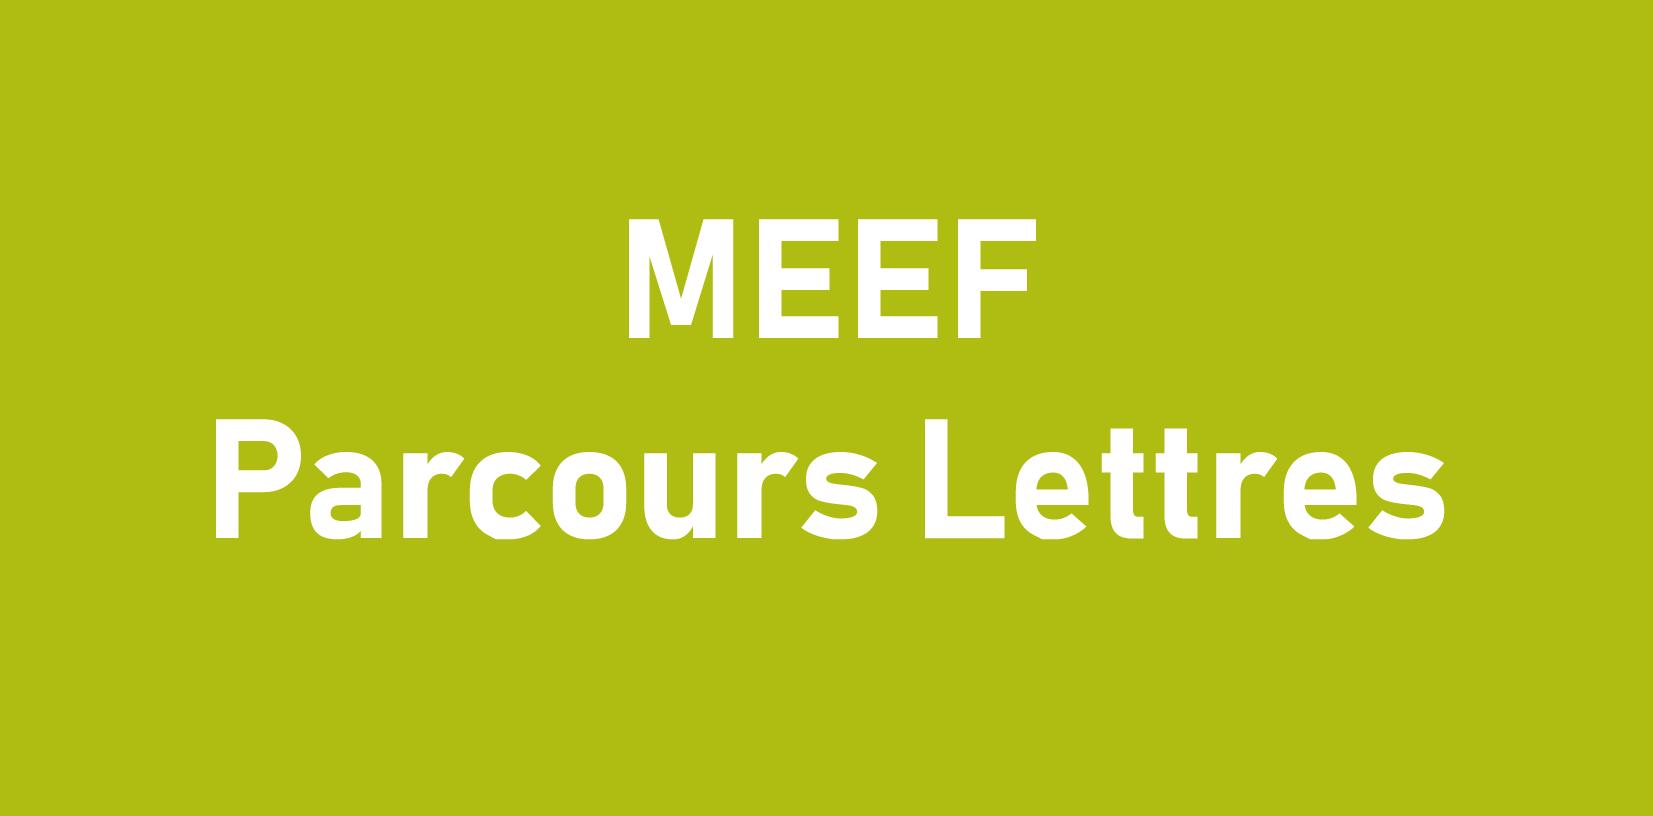 MEEF Parcours Lettres